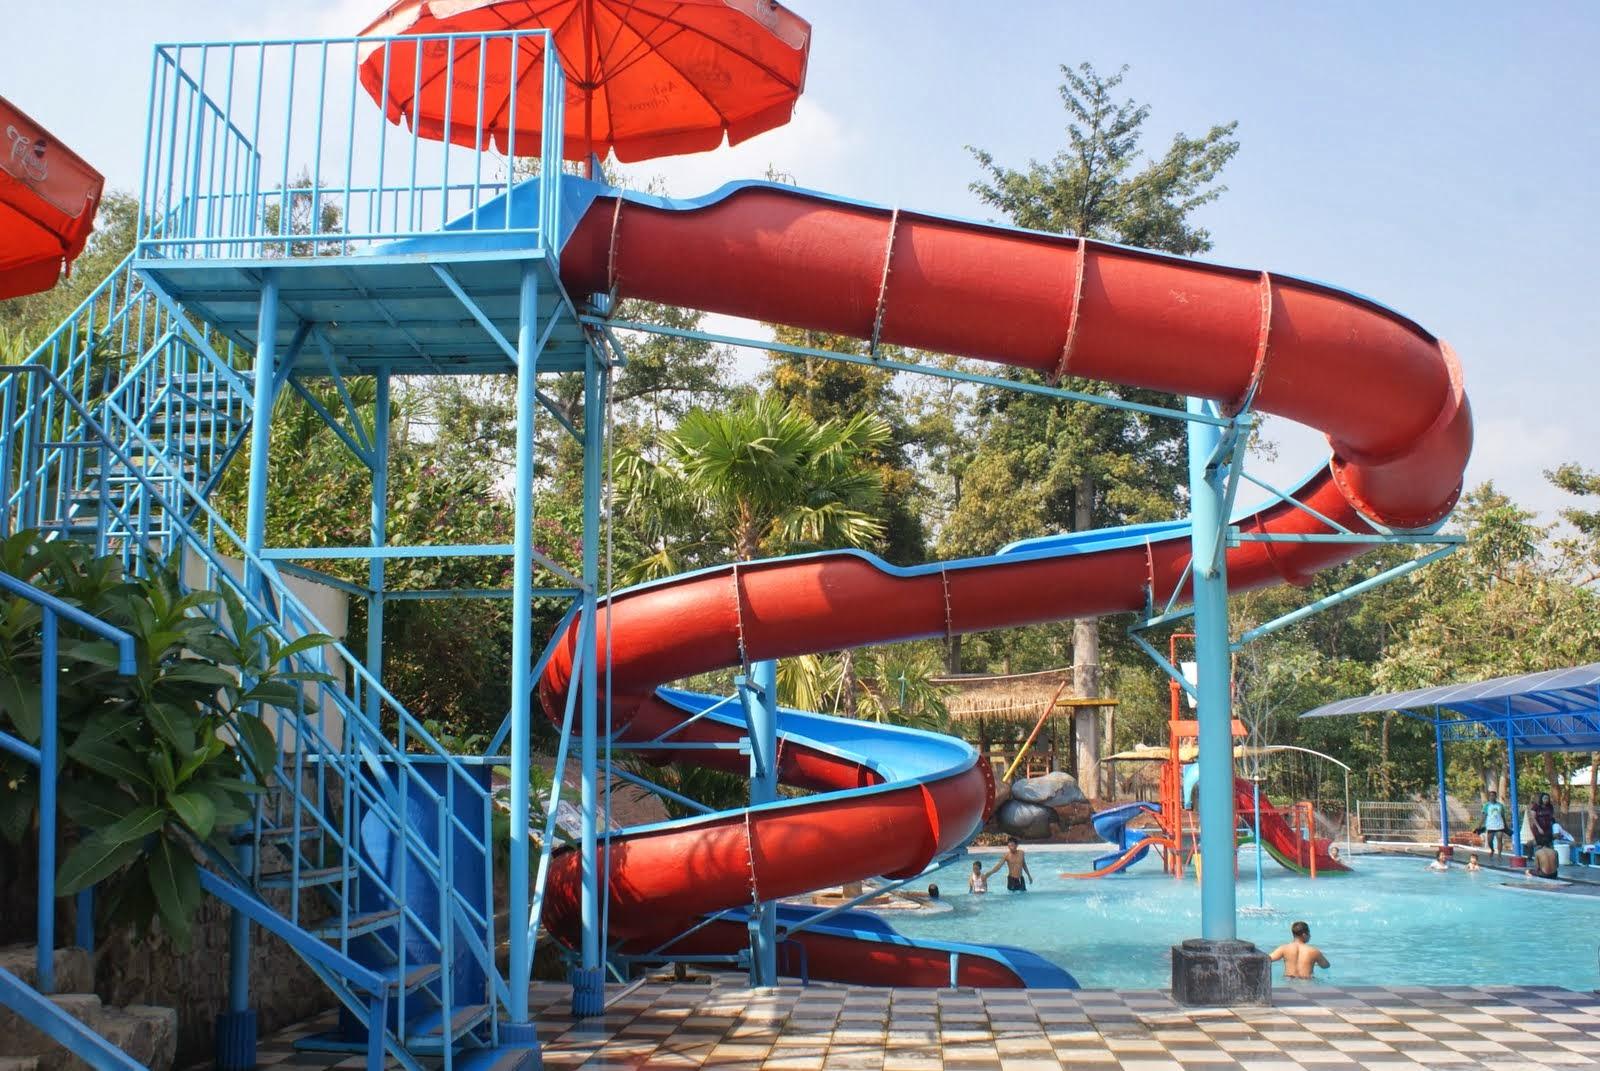 18 Tempat Wisata Mojokerto Ngehits Tanya Pacet Mini Park Taman